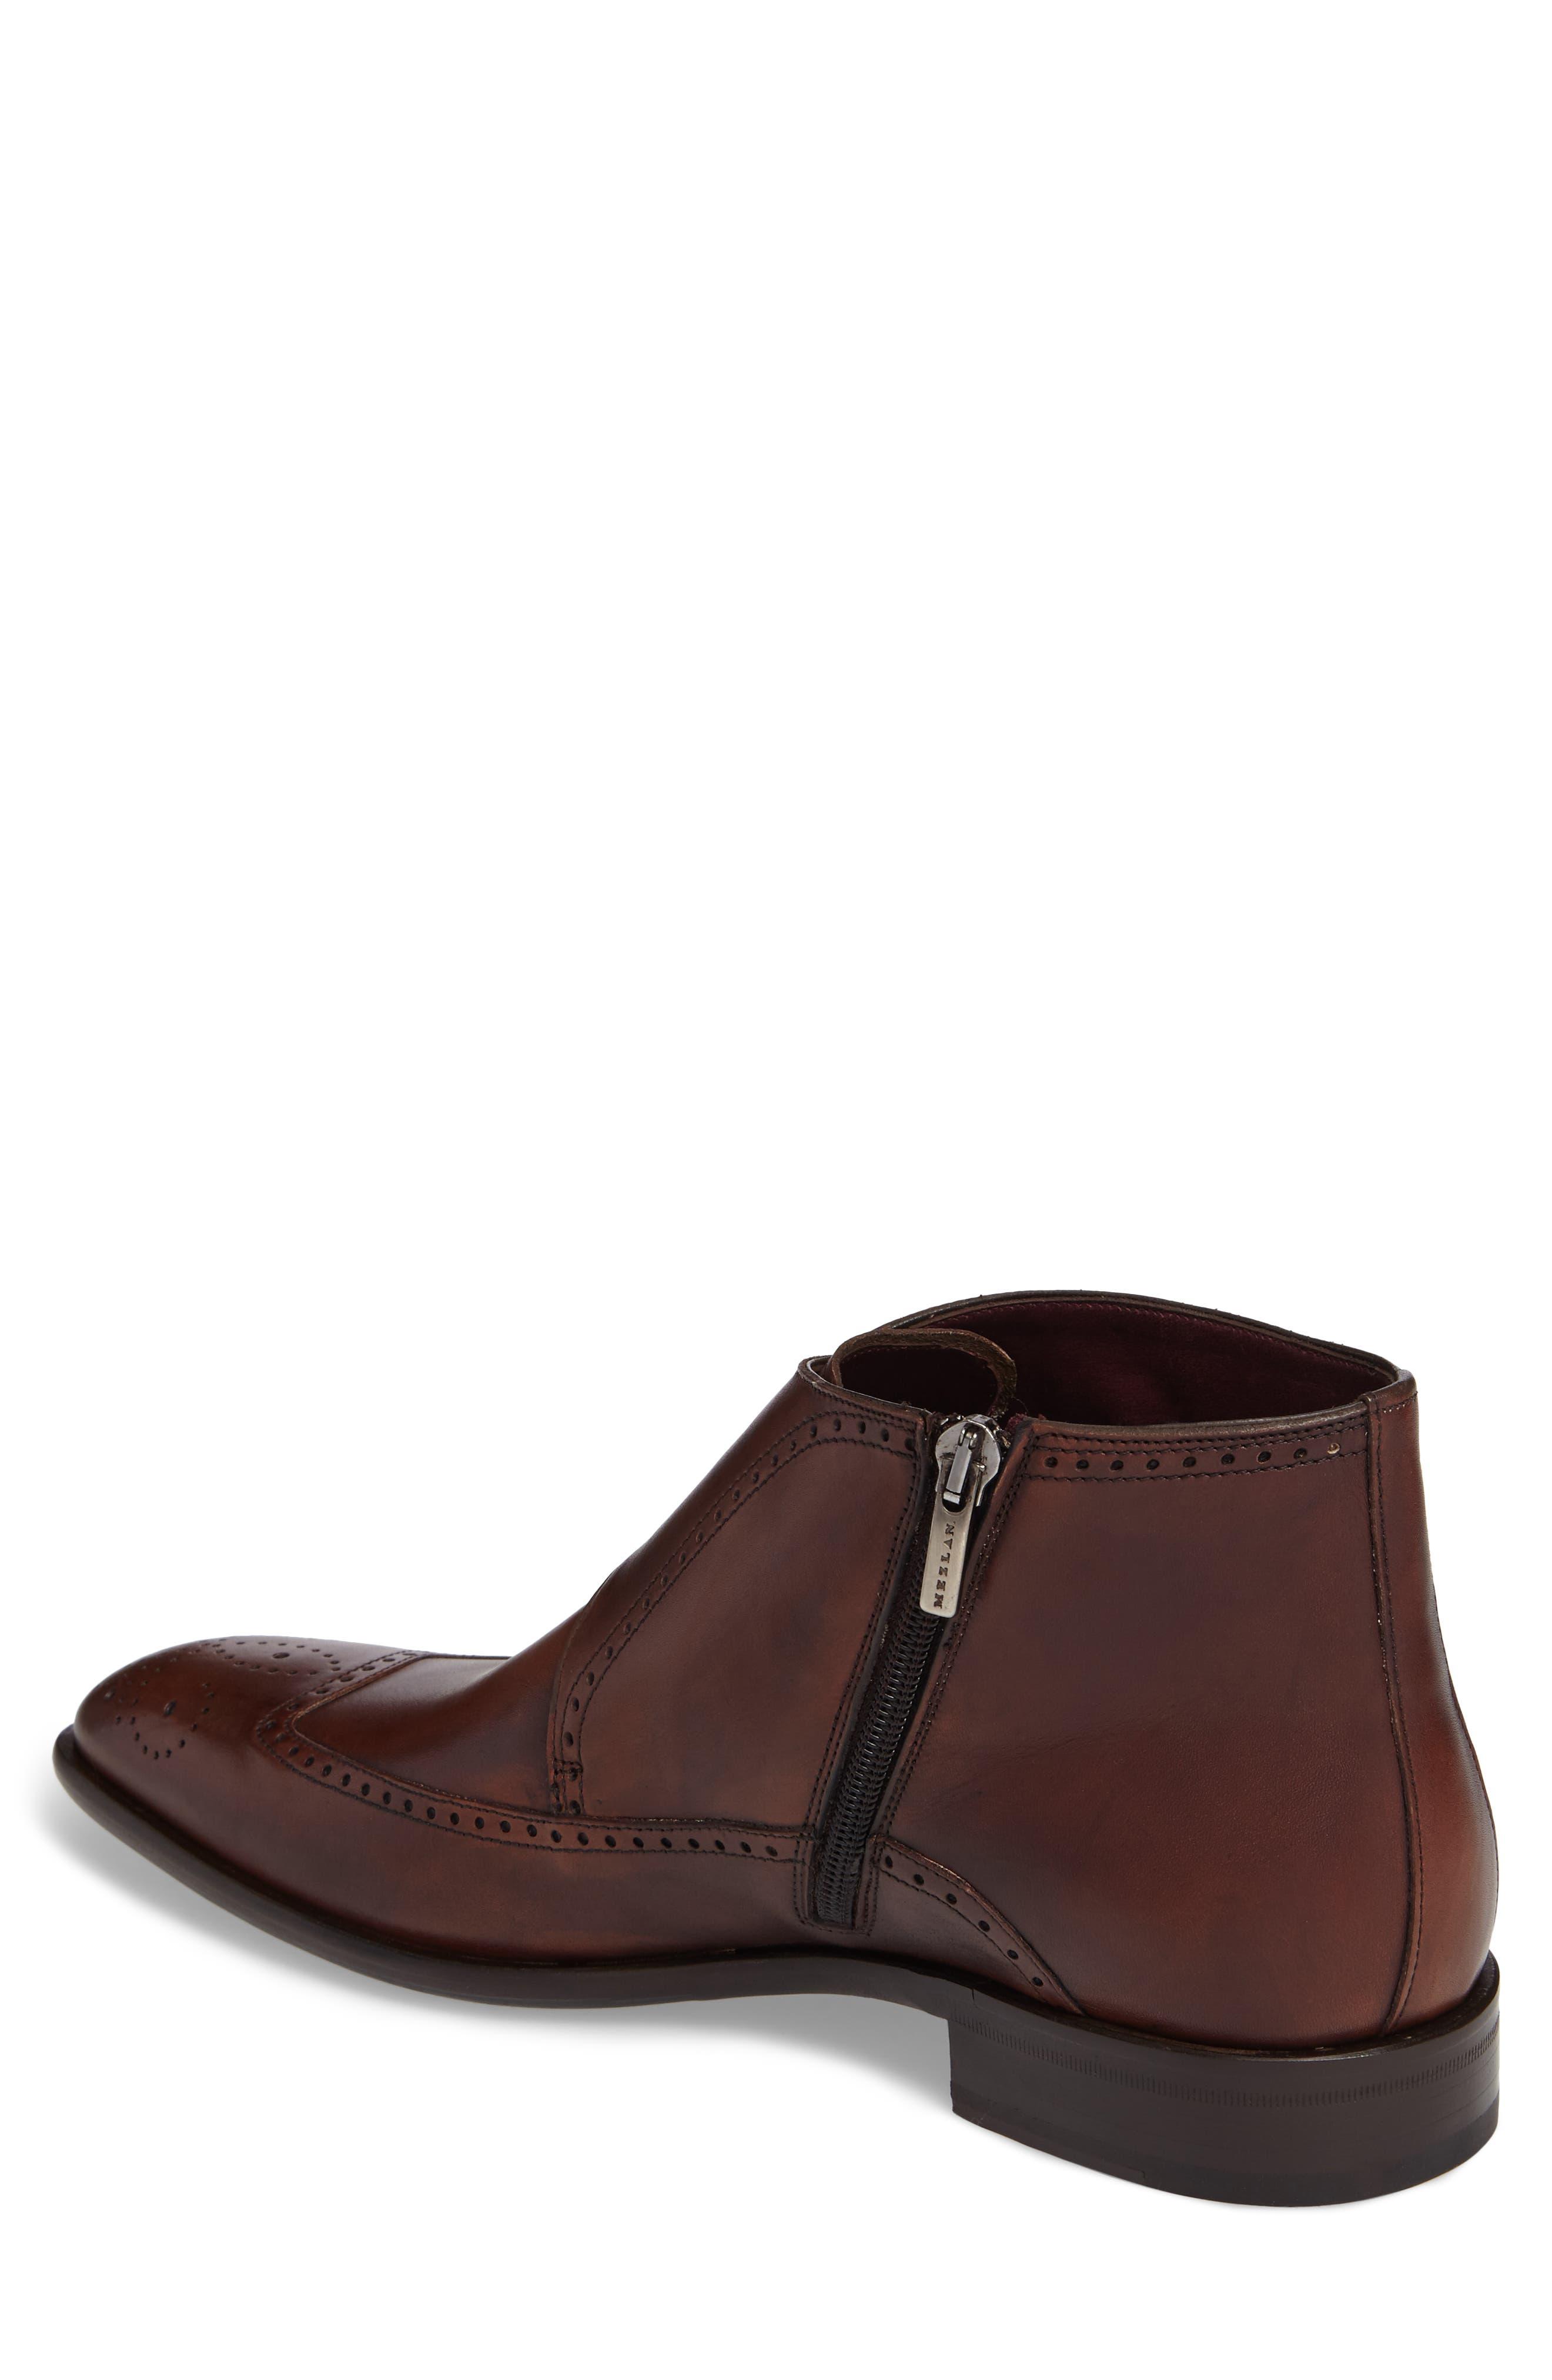 Taberna Double Monk Strap Boot,                             Alternate thumbnail 2, color,                             Cognac Leather